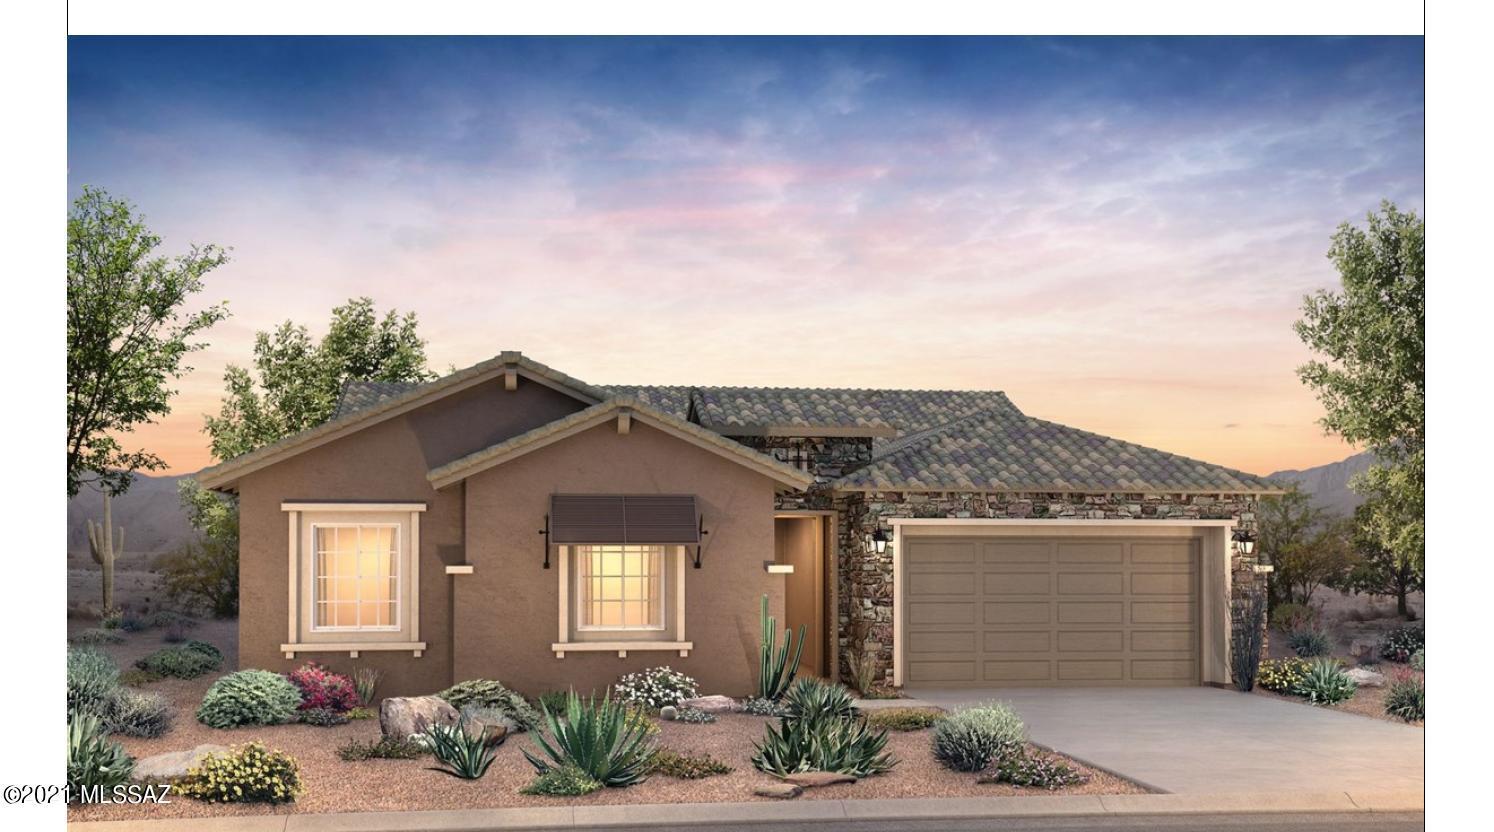 Photo of 686 E Nubra Valley Place, Oro Valley, AZ 85755